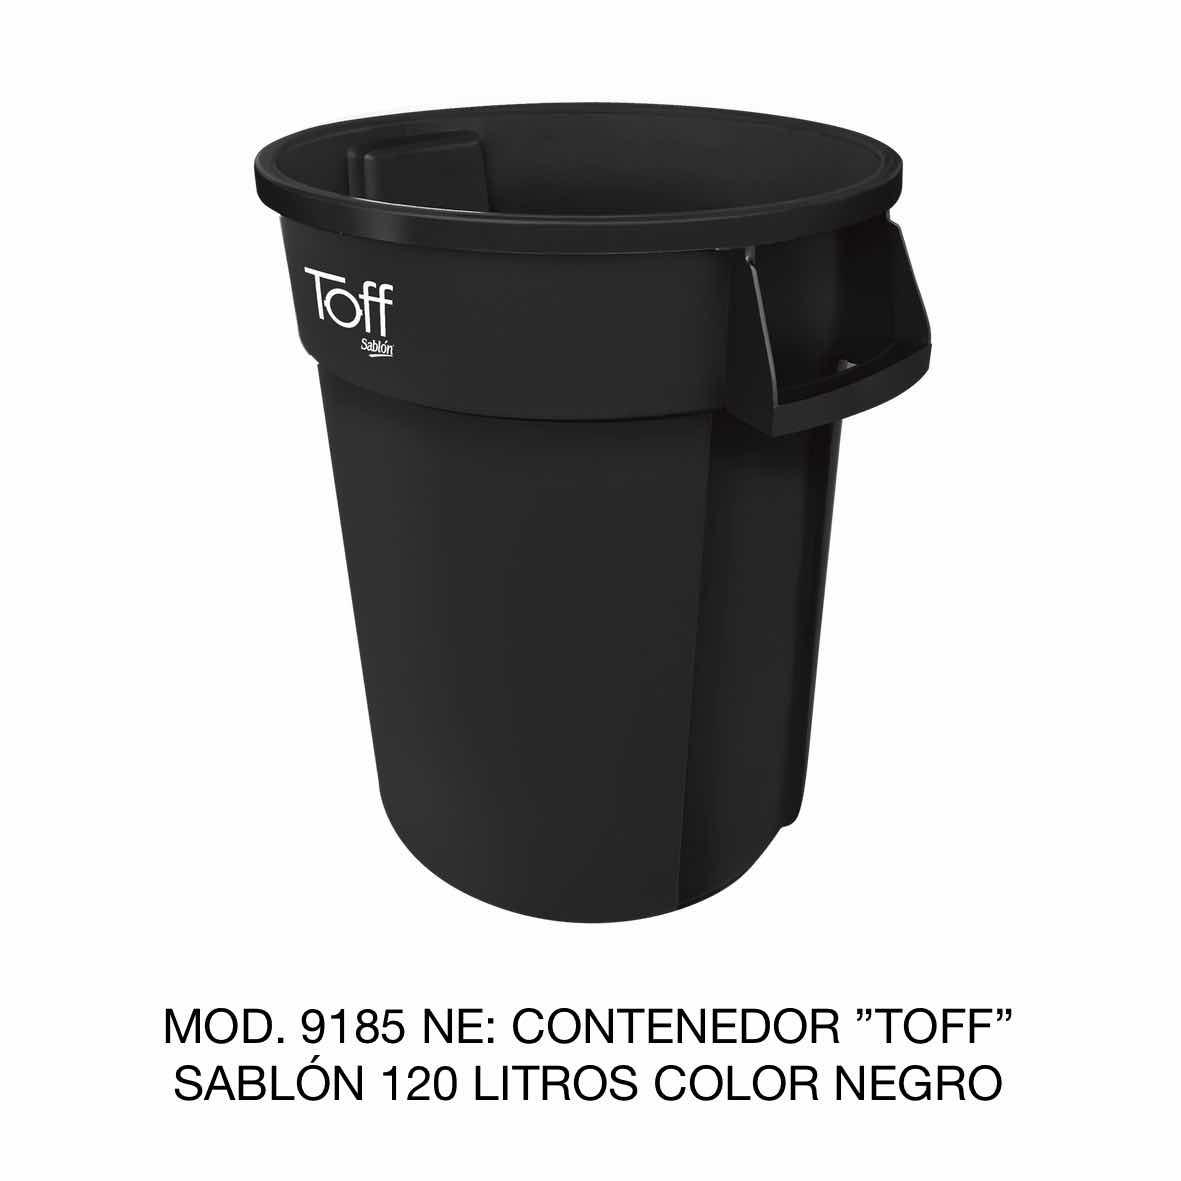 Contenedor de basura Sablón modelo TOFF de 120 litros Modelo 9185 NE Color Negro